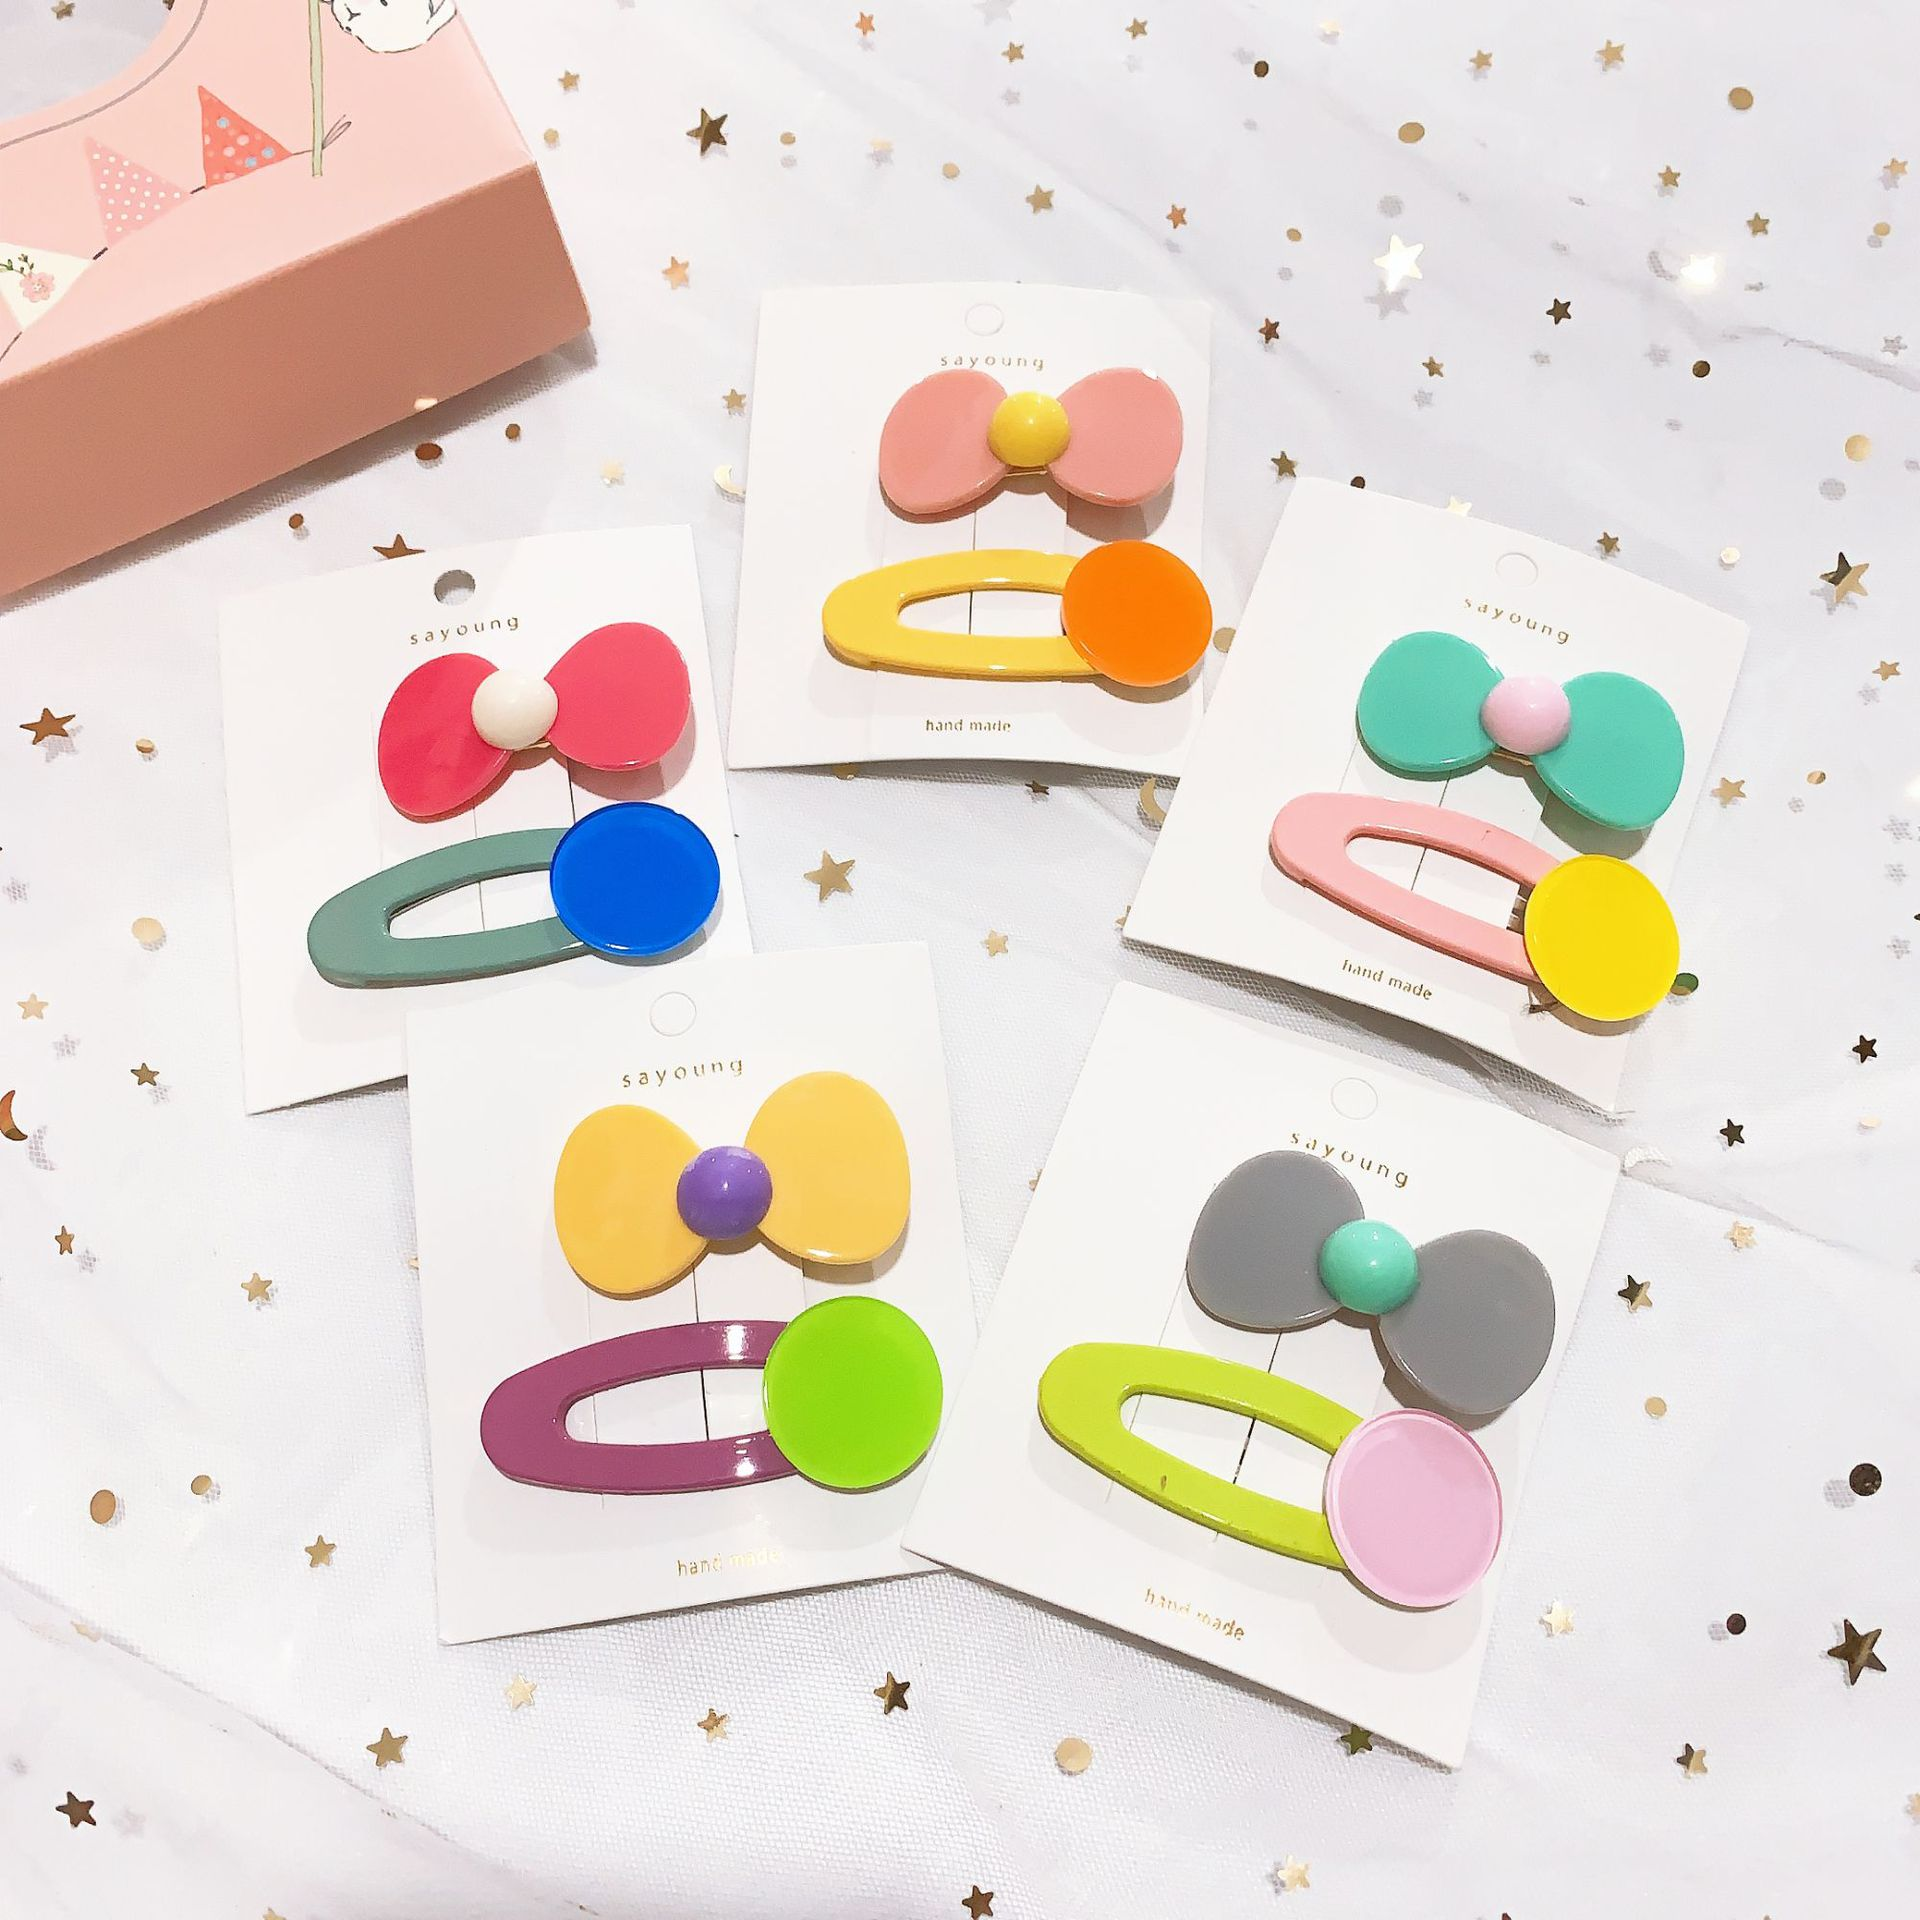 2PC Lovely Children's Series Bow Knot Hair Pins Sweet Girls Plastic Hair Grips Hair Accessories HeadWear